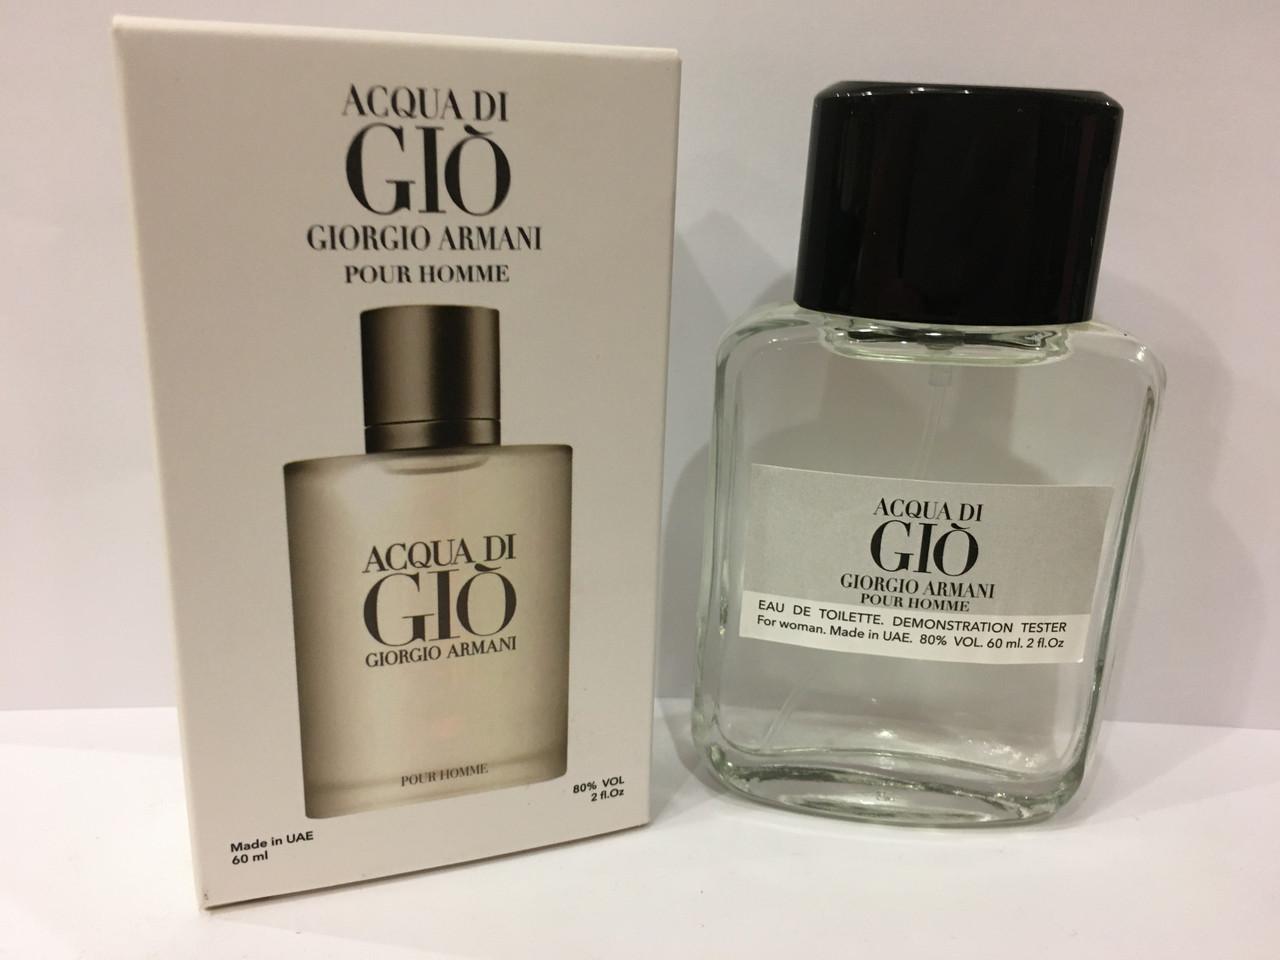 Мужские духи мини тестер Giorgio Armani Acqua di Gio DutyFree 60 мл (Джорджио Армани Аква Ди Джио)